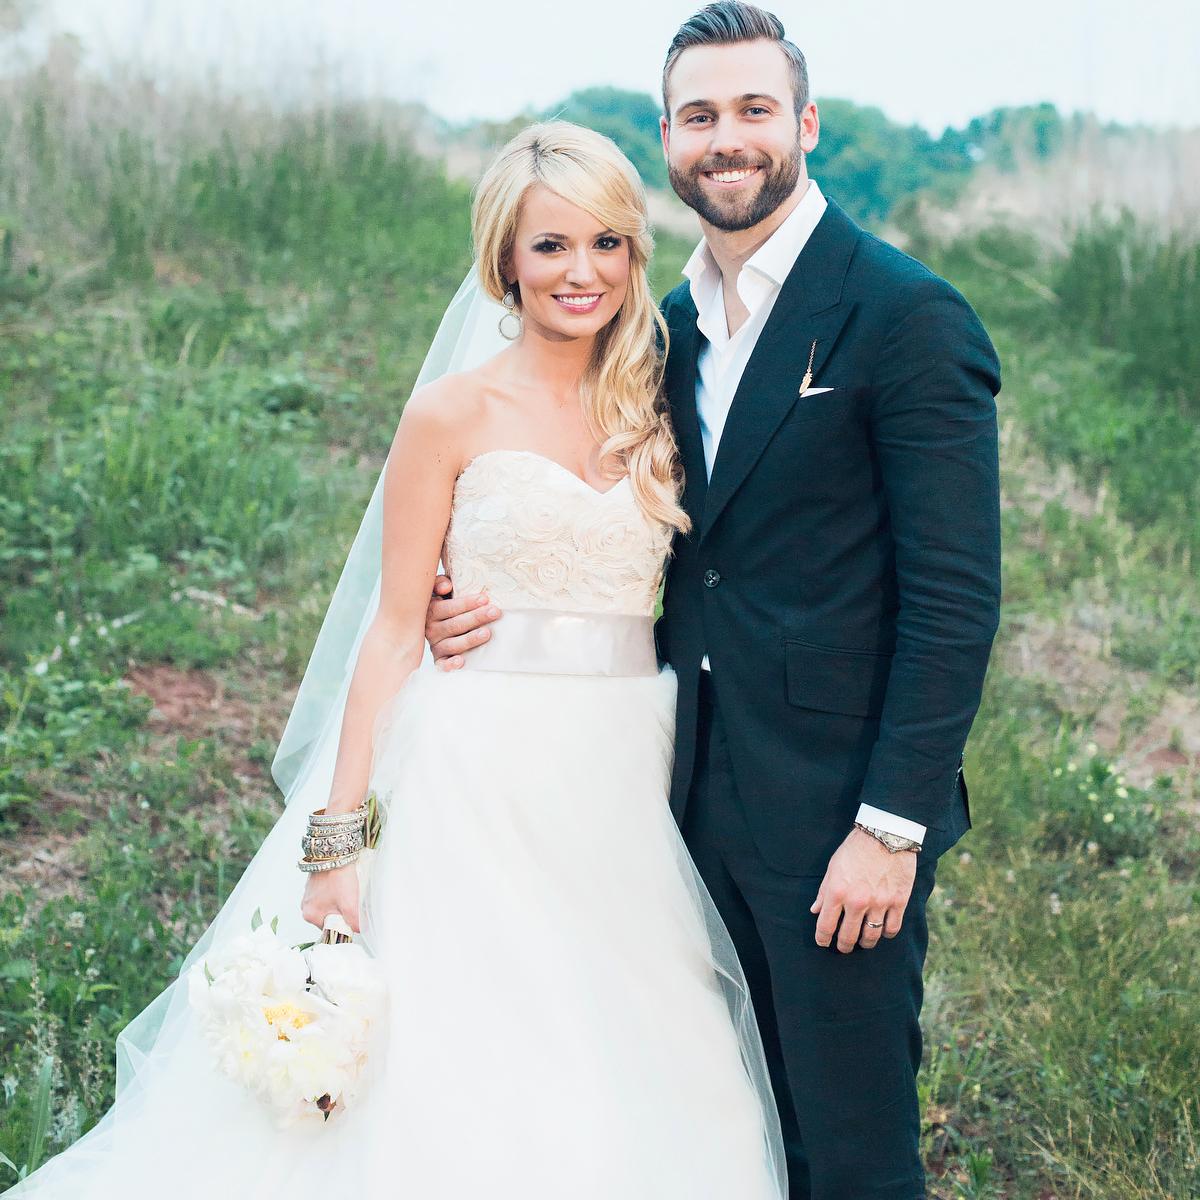 Emily Maynard Wedding: Emily Maynard + Tyler Johnson's Surprise Wedding